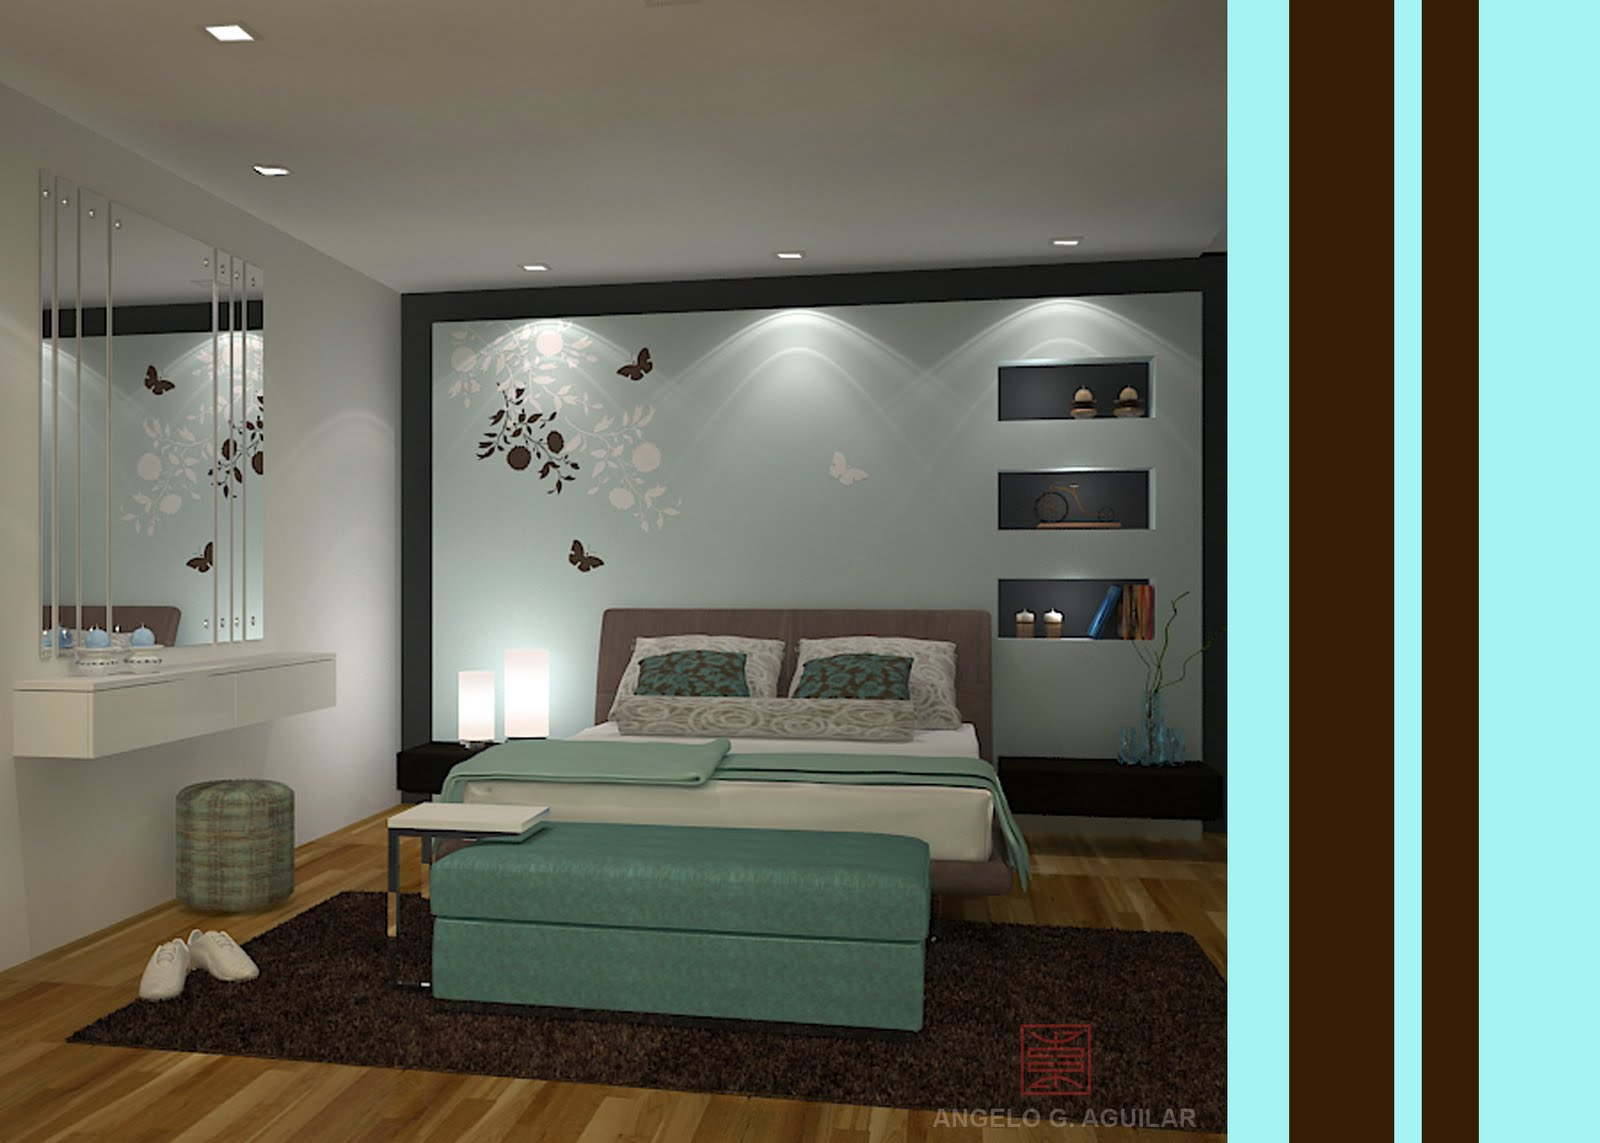 Bedroom interior design in the philippines bedroom for Bedroom design philippines